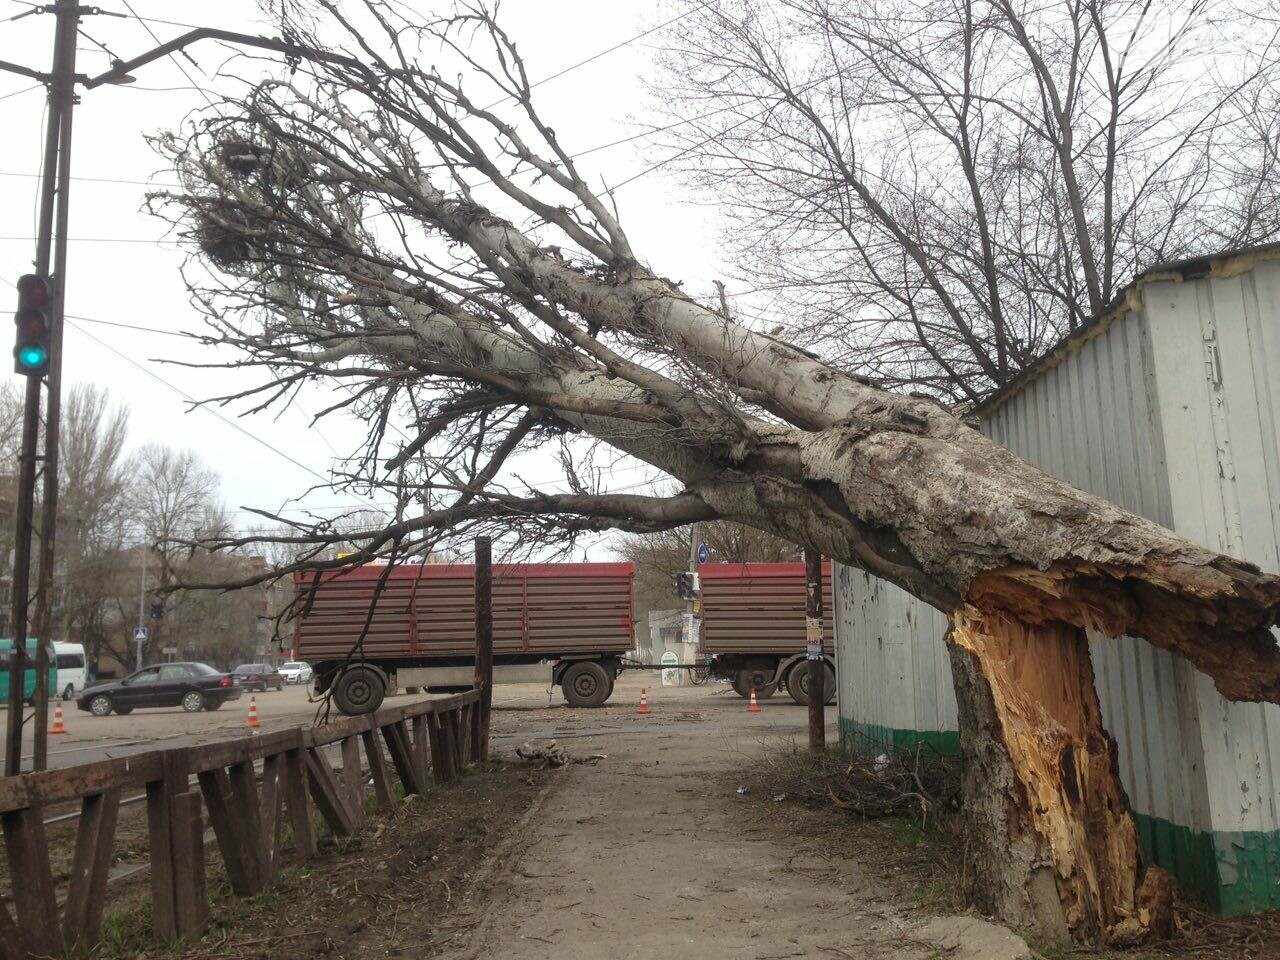 В Николаеве из-за сильного ветра дерево упало на дорогу и задело провода, - ФОТО, фото-5